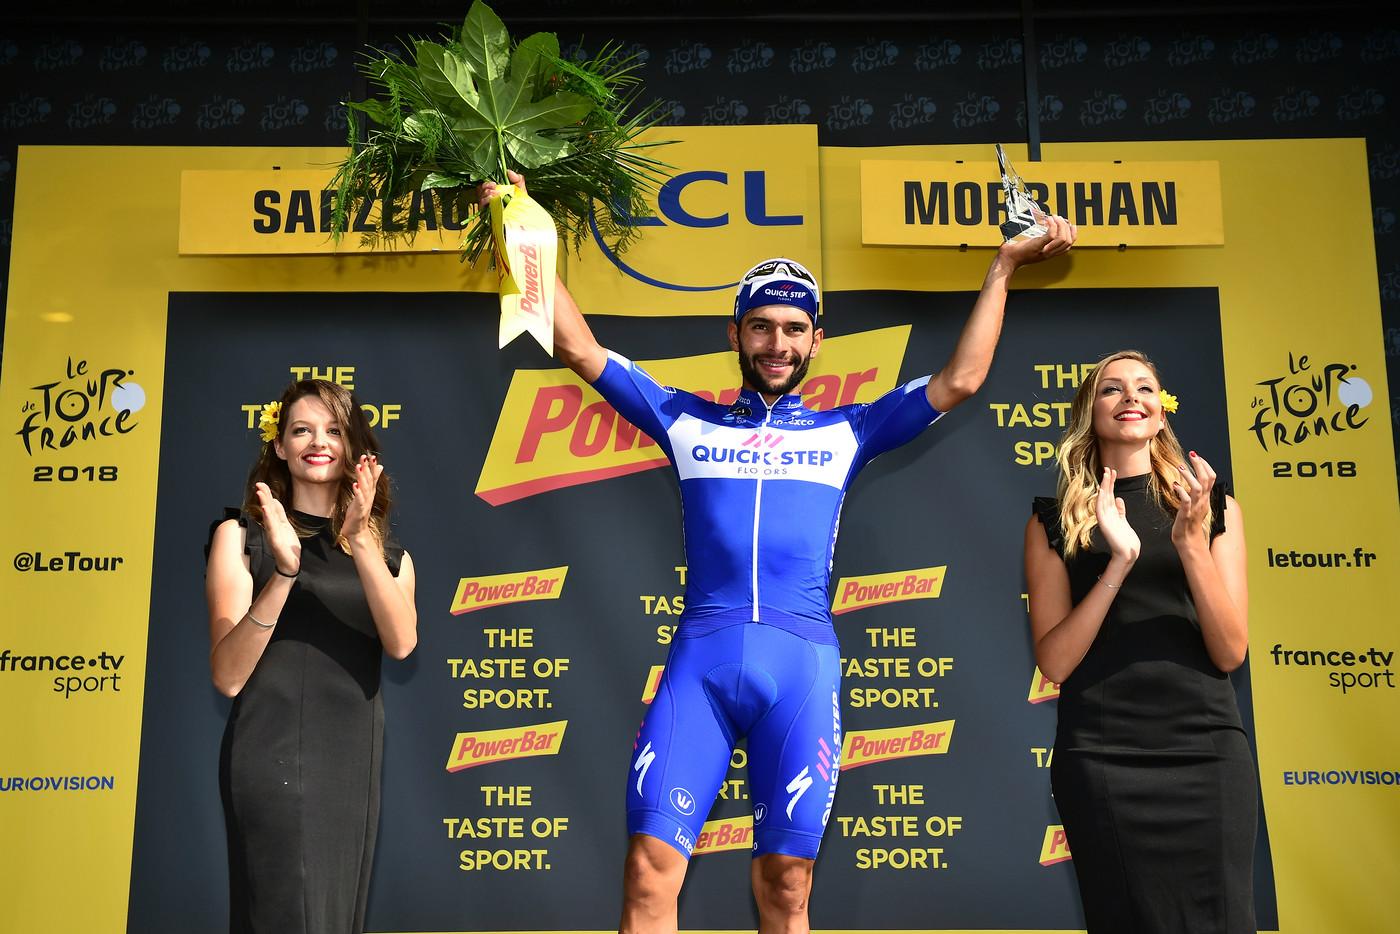 2018 Tour de France Fernando Gaviria stage winner